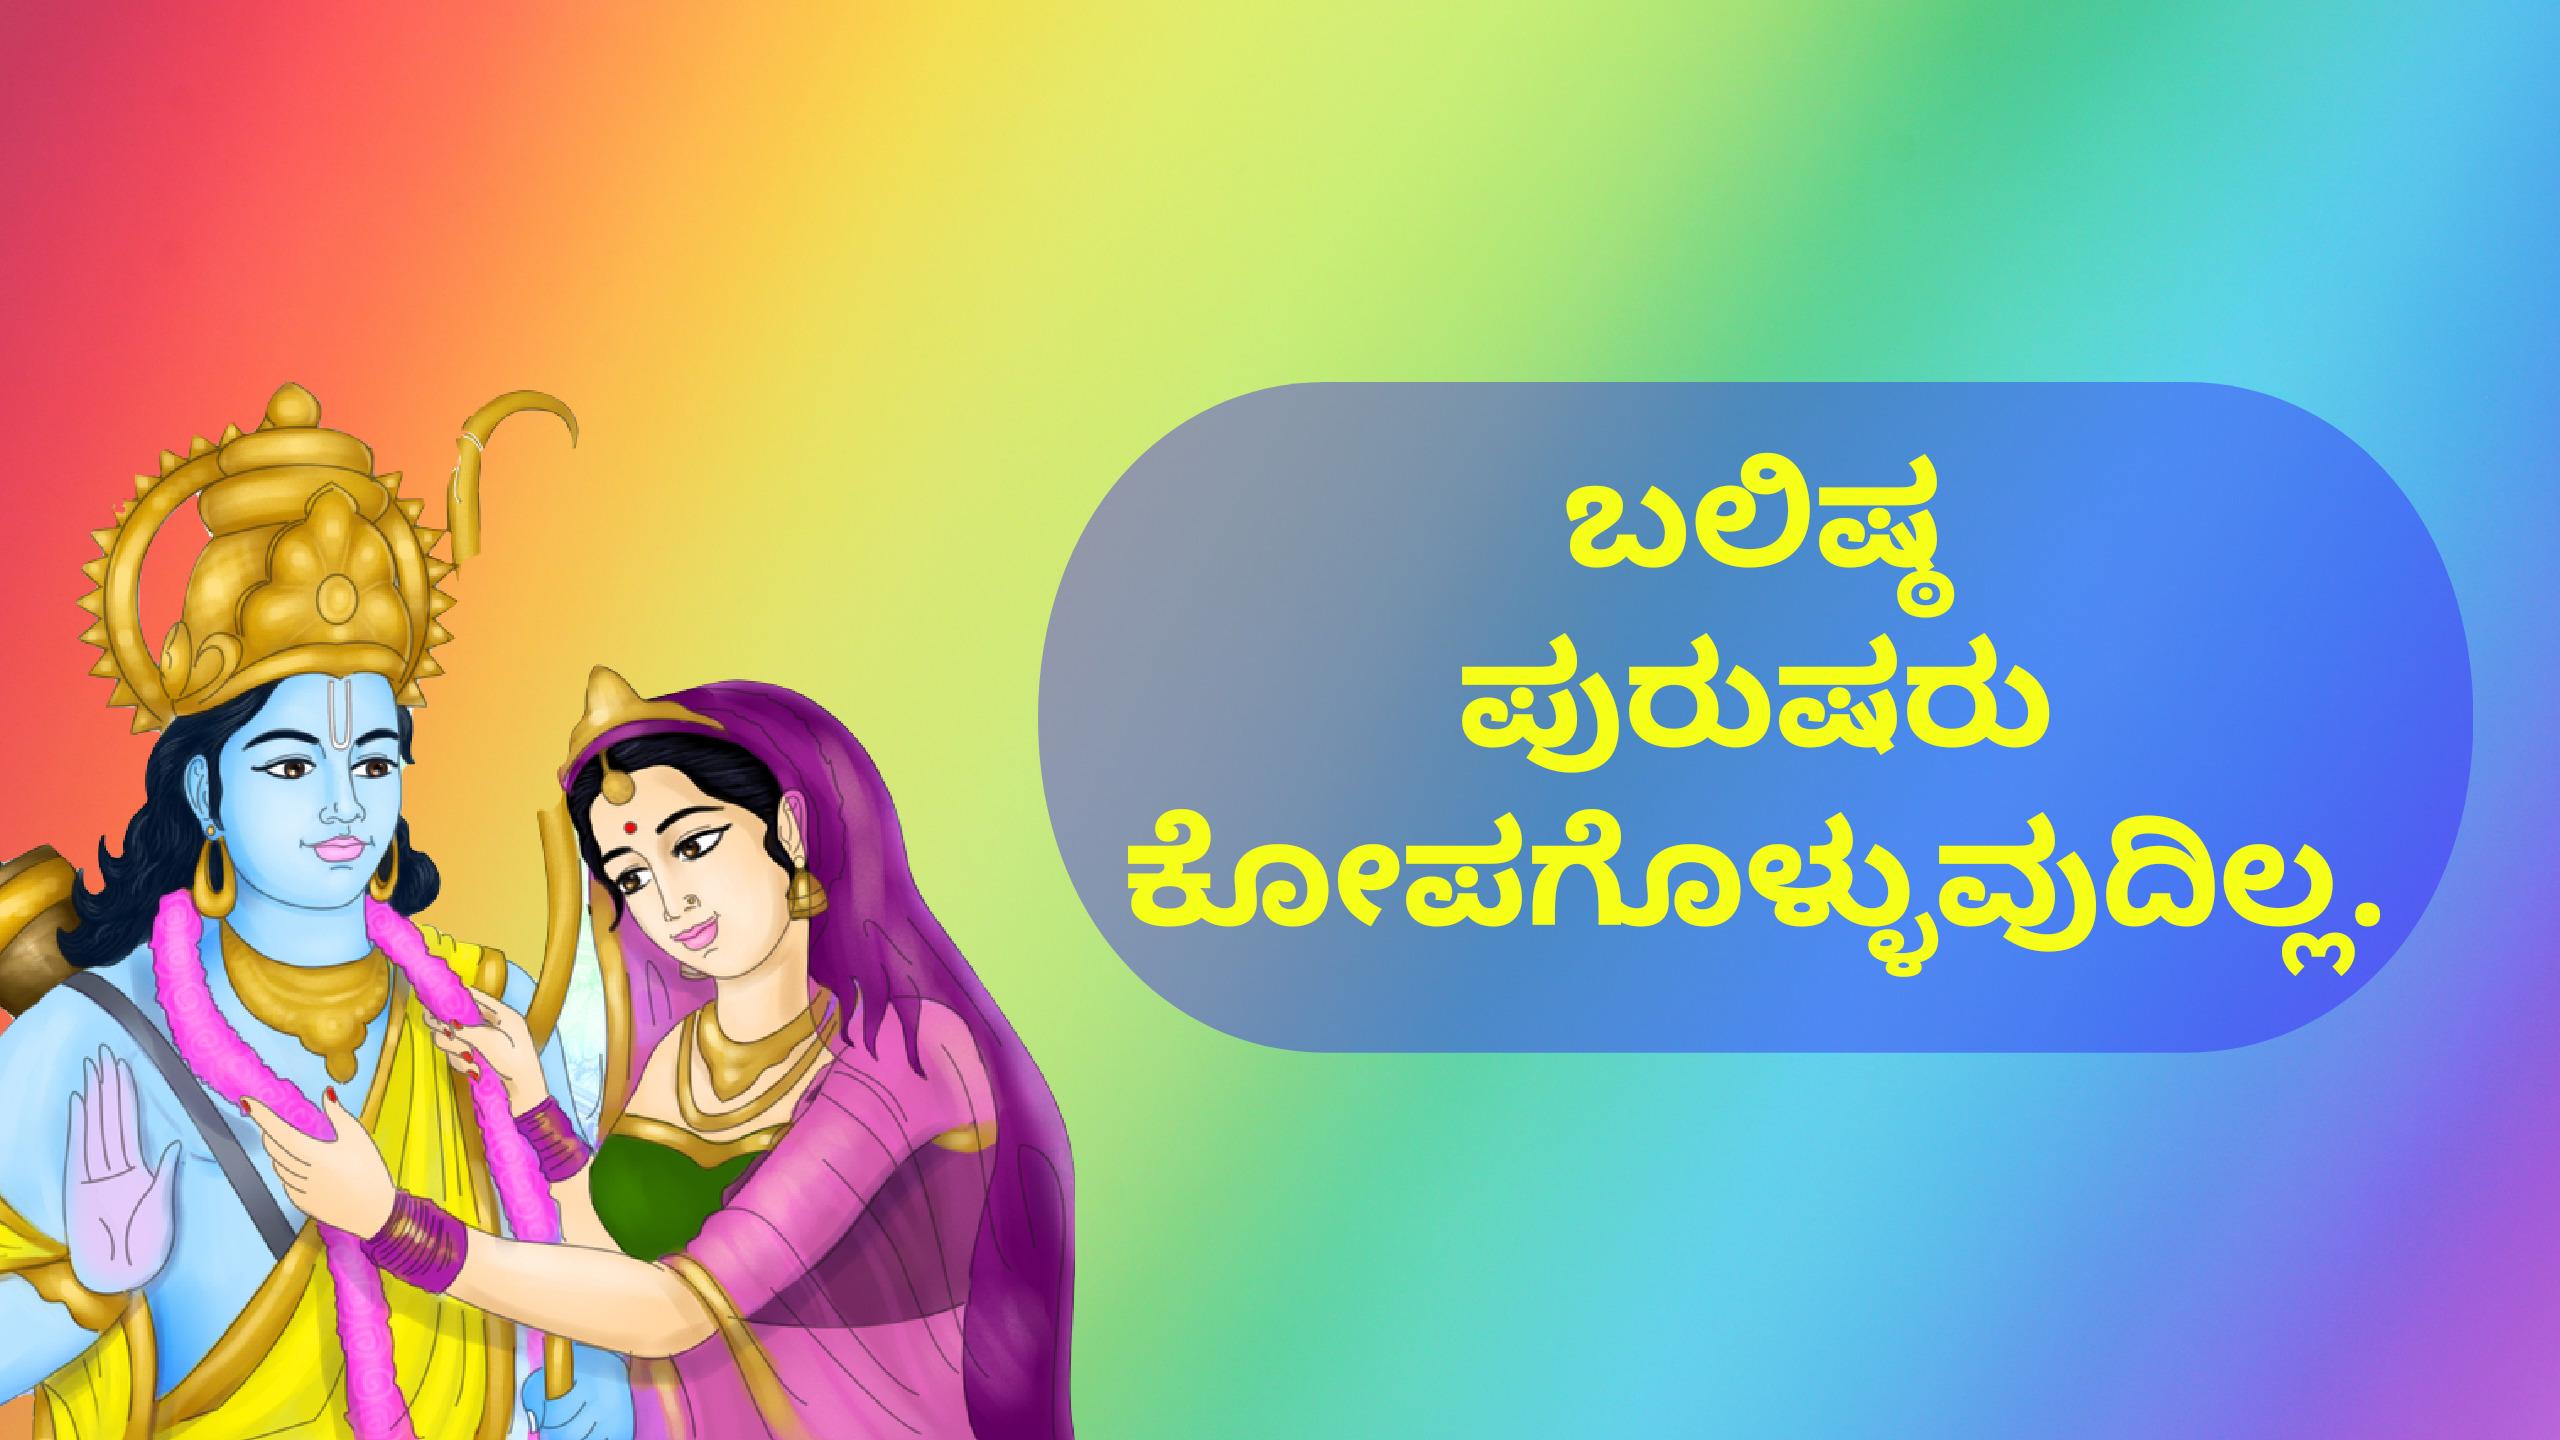 3. Shree Ram Quotes in Kannada